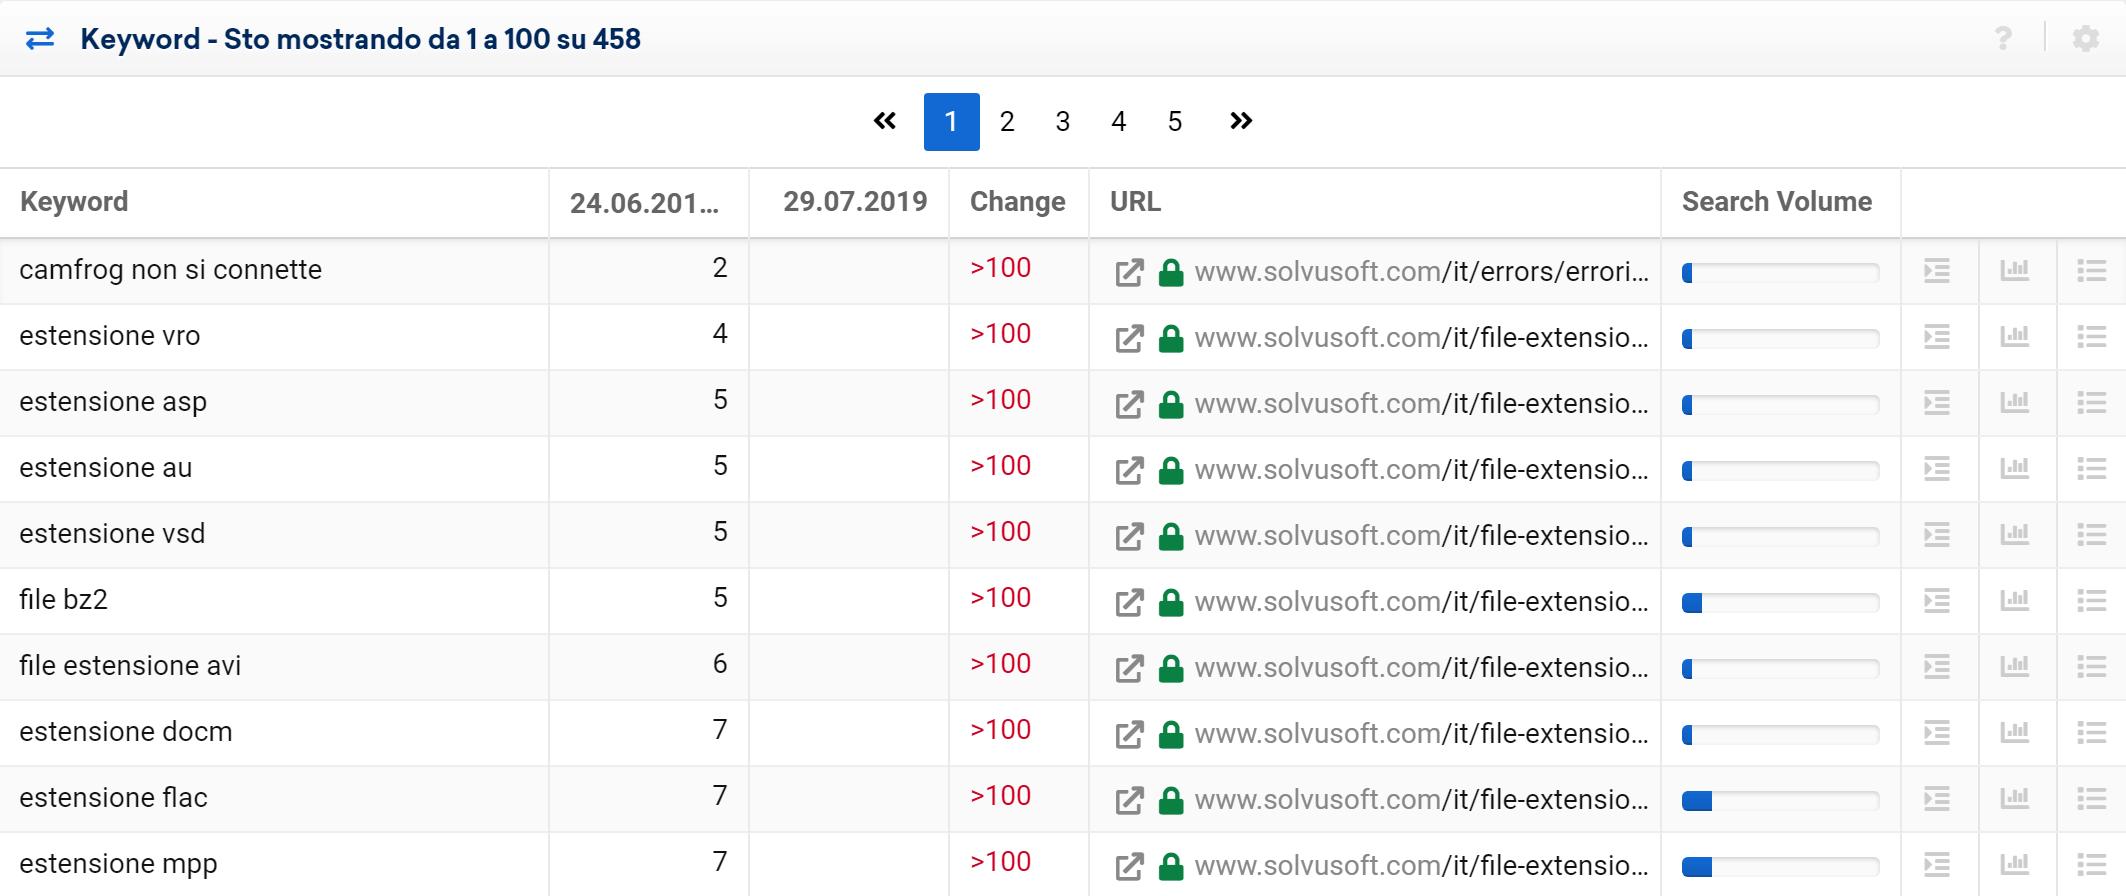 Toolbox SISTRIX: keyword perse di solvusoft.com tra il 24/06/2019 e il 29/07/2019